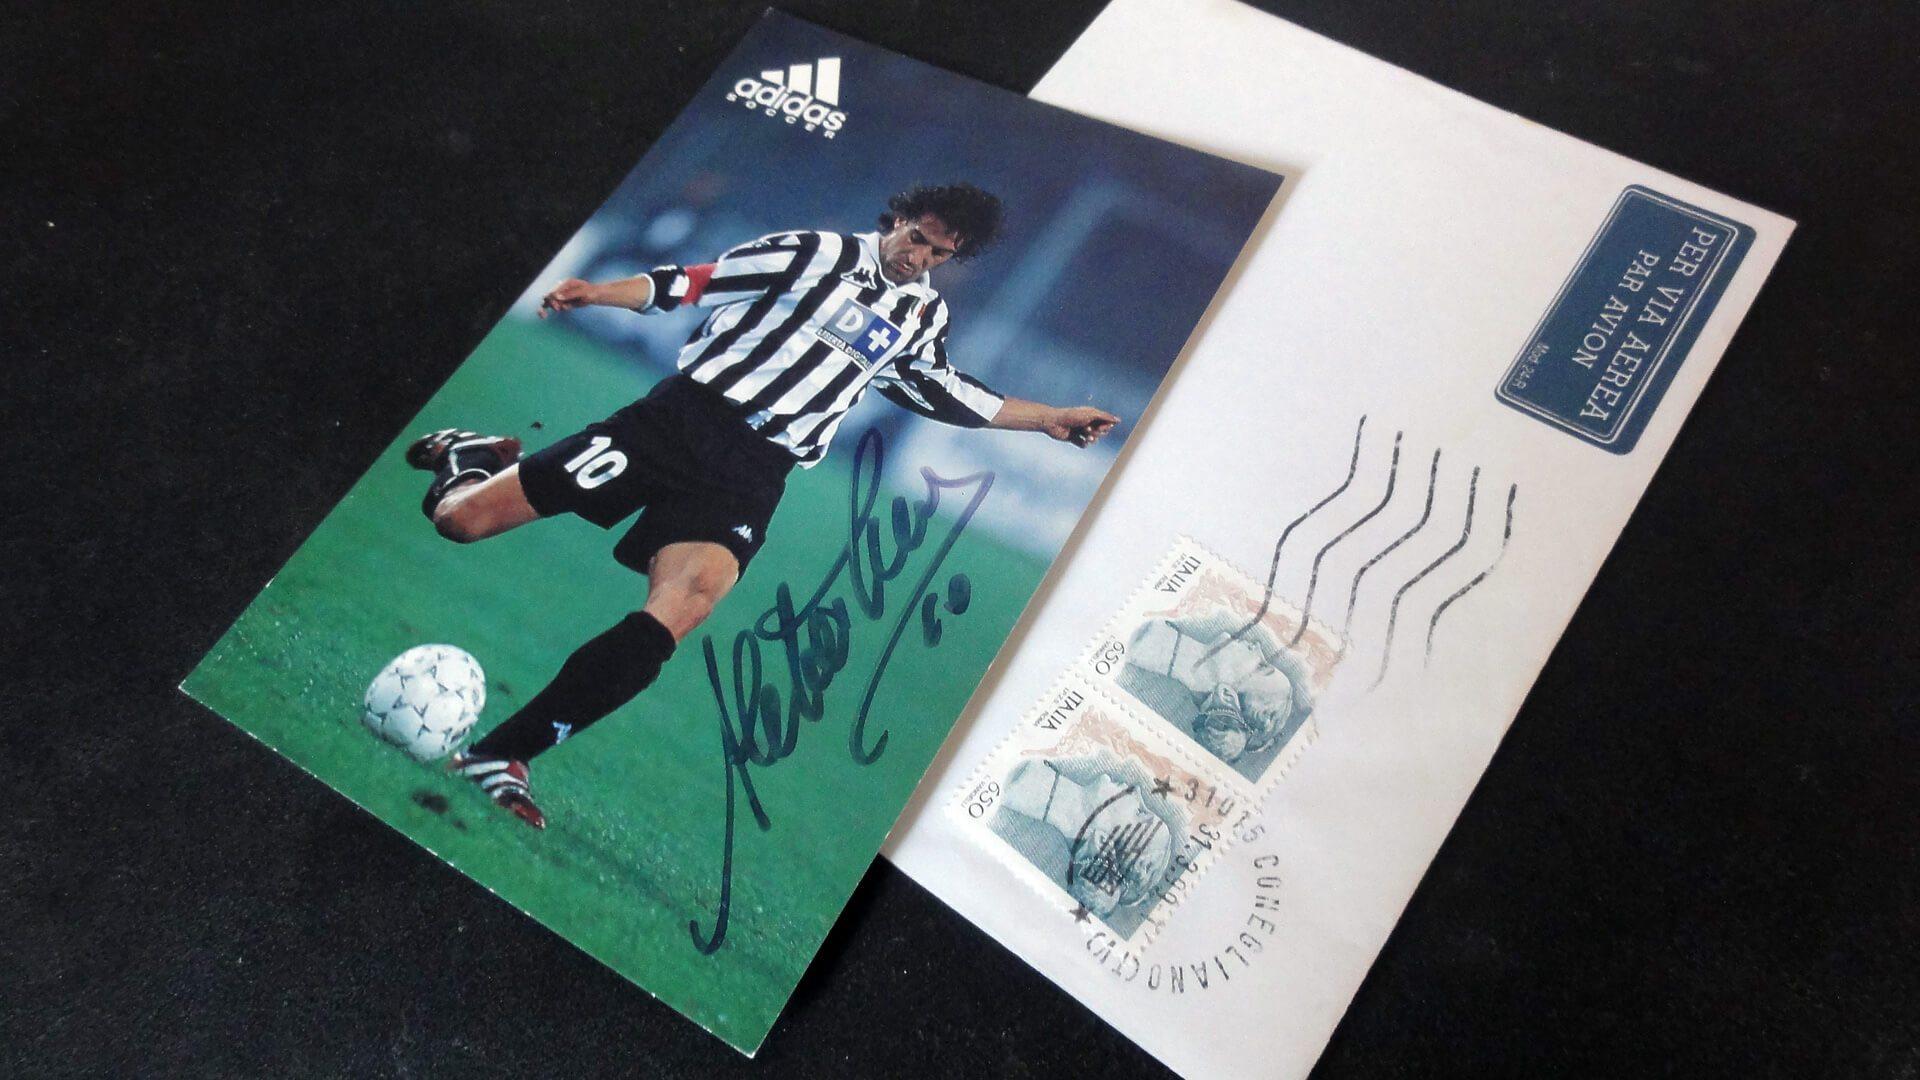 Fan letter Alessandro Del Piero